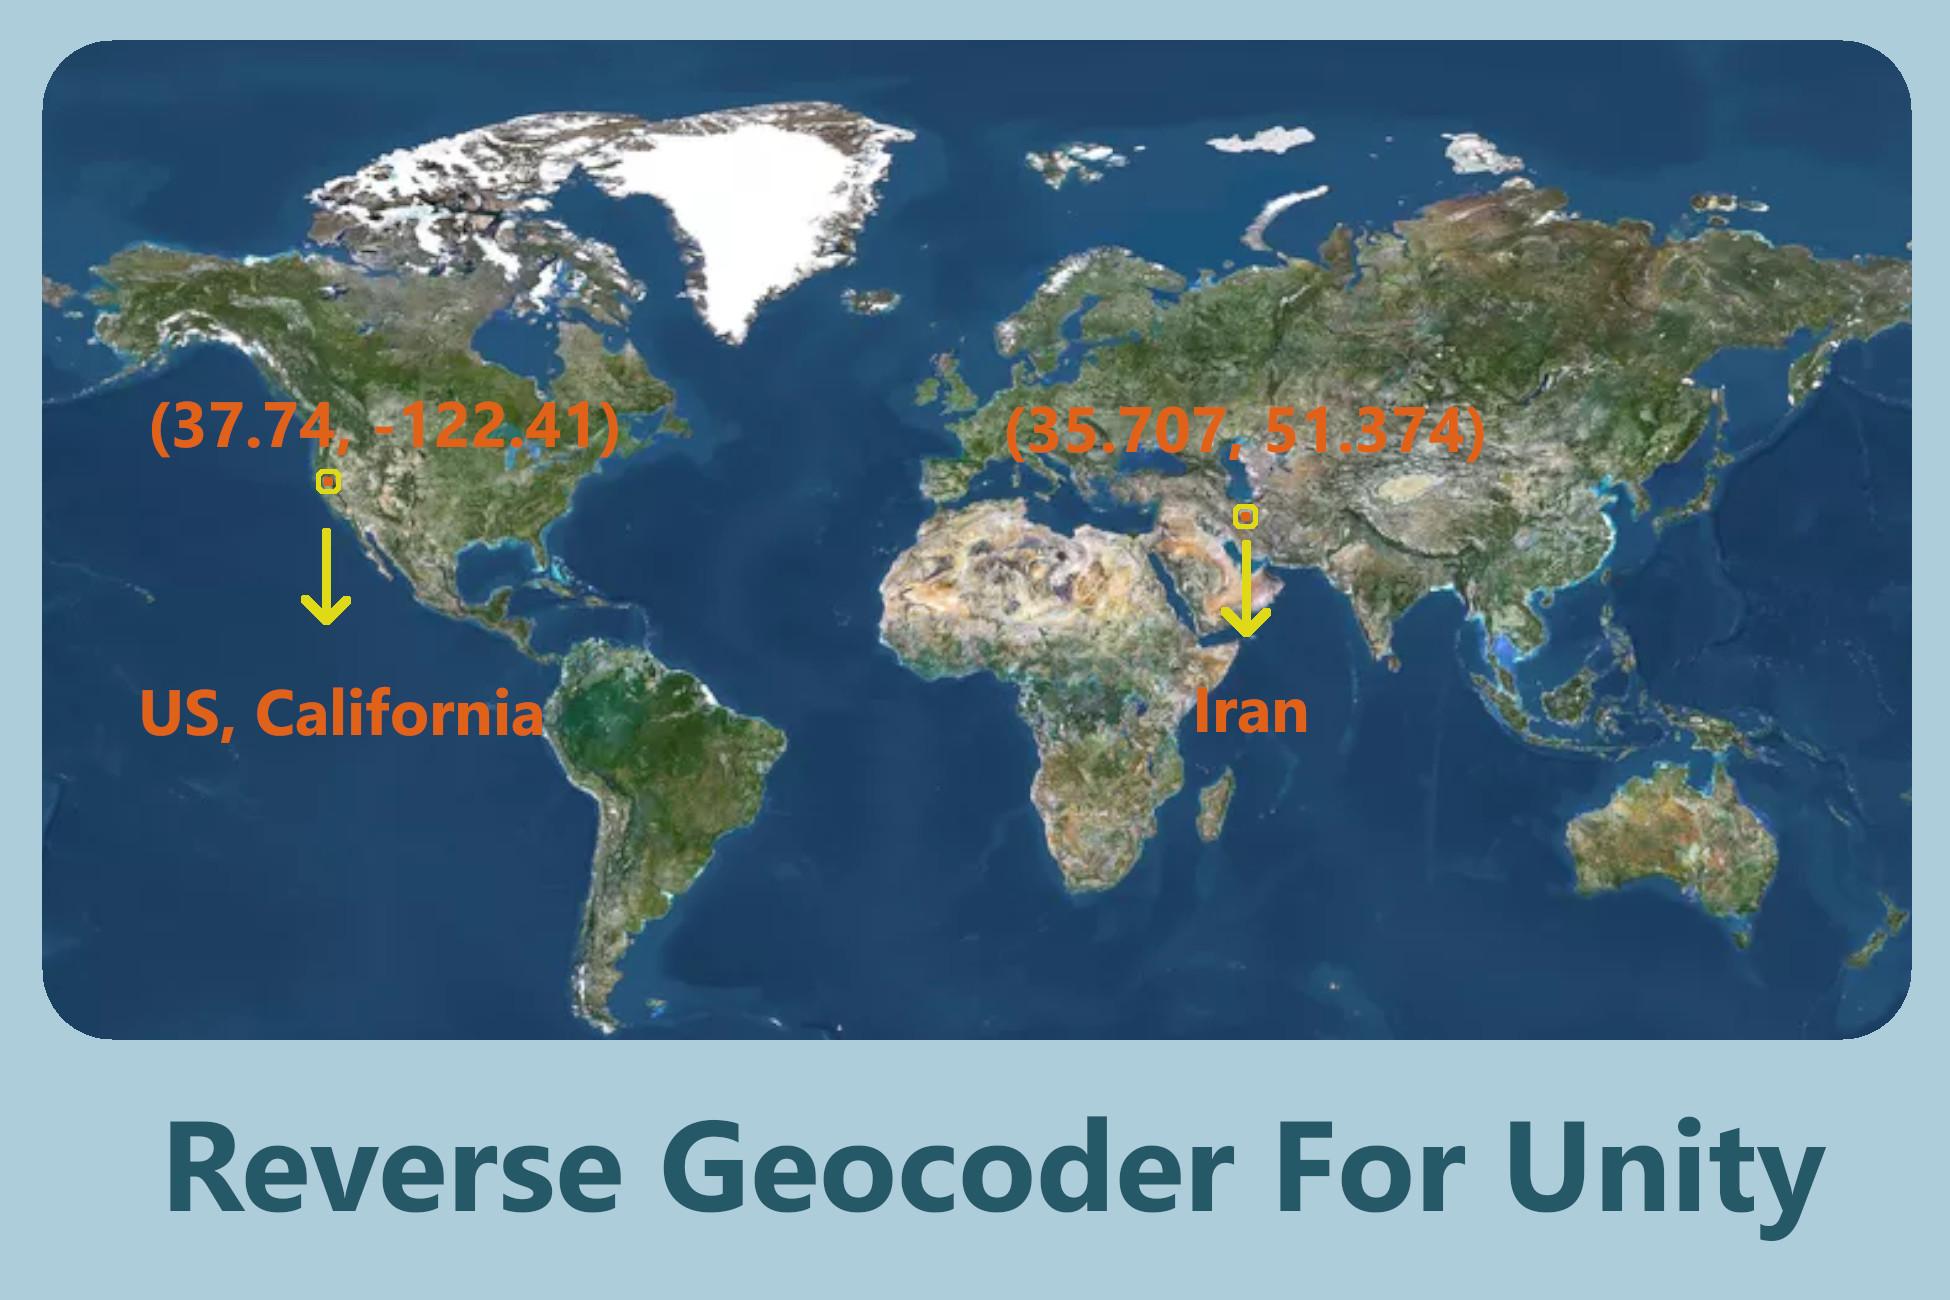 Reverse Geocoder